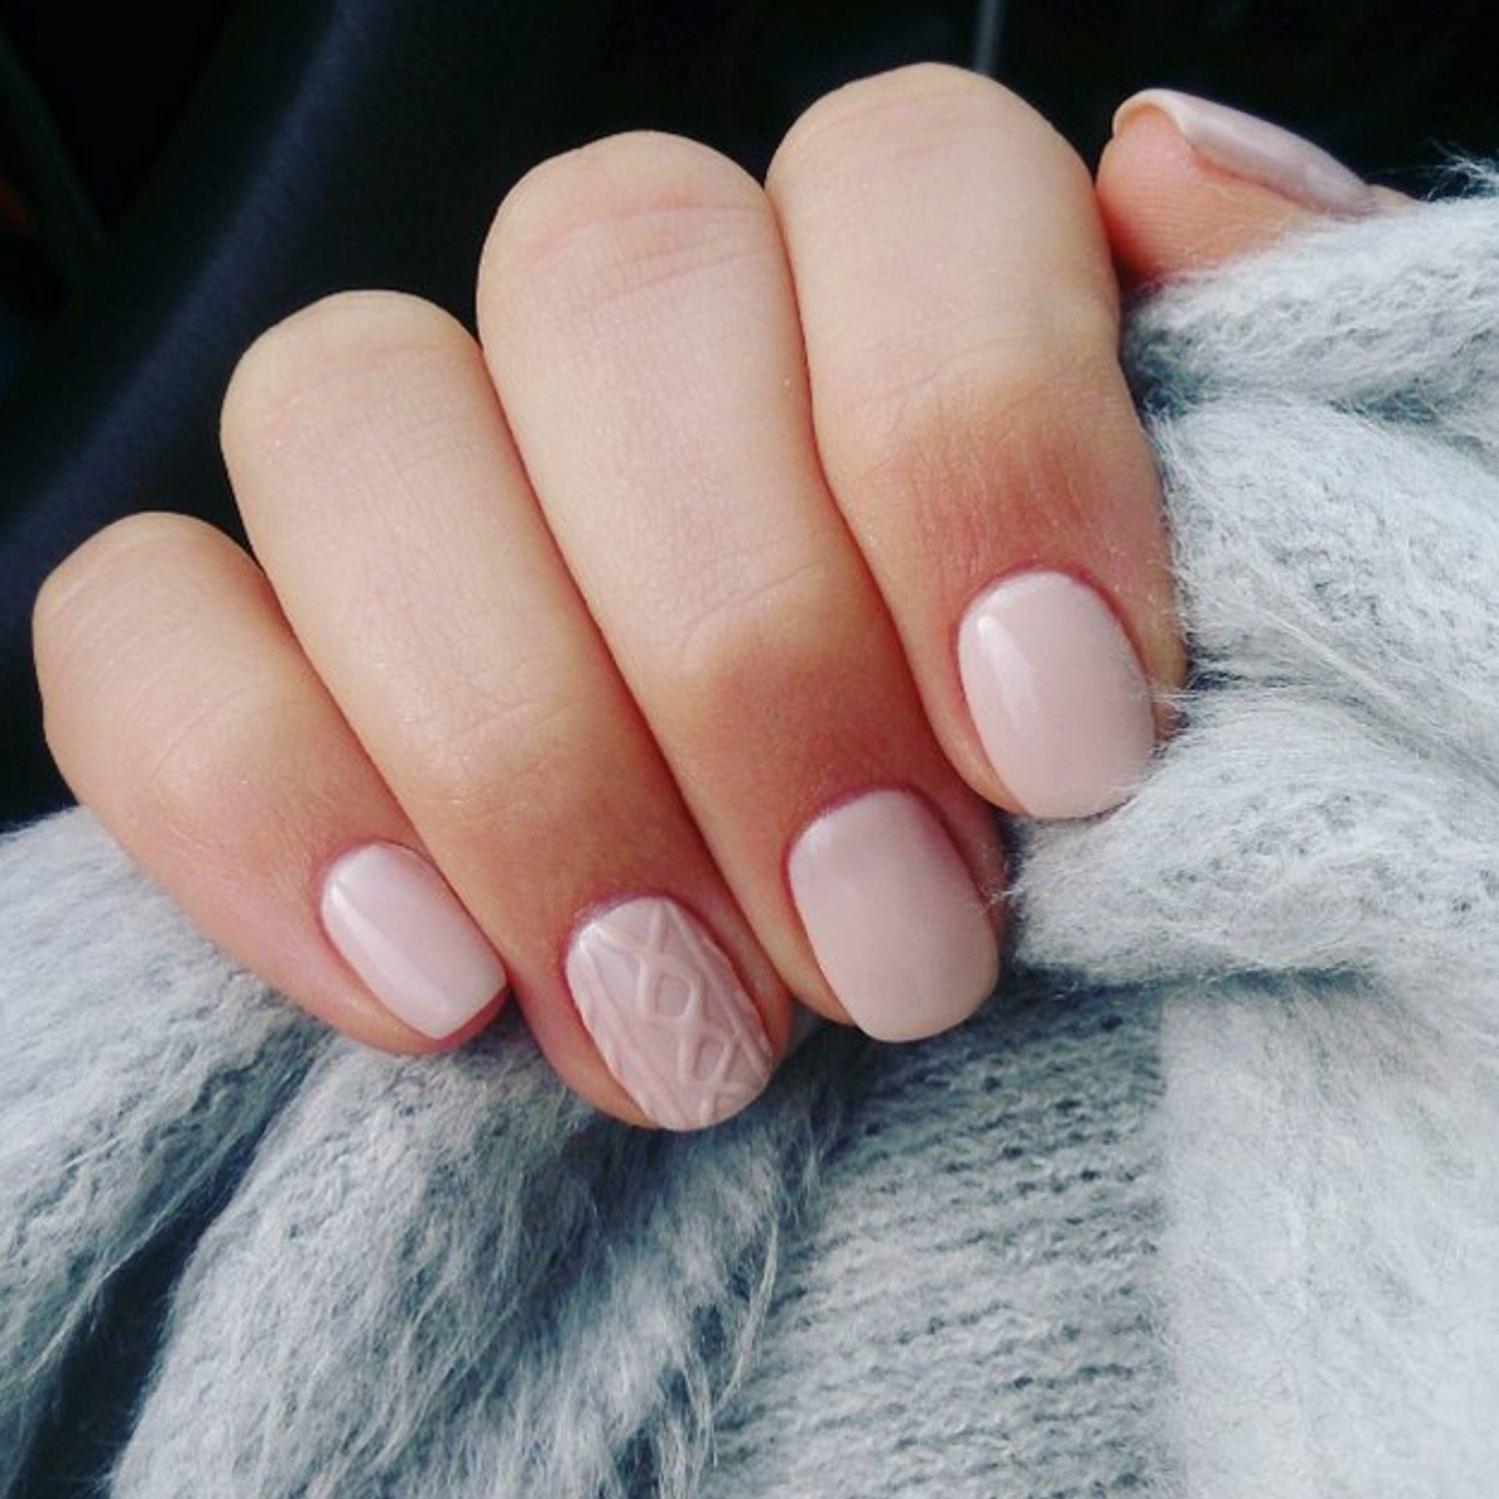 nails.jpg